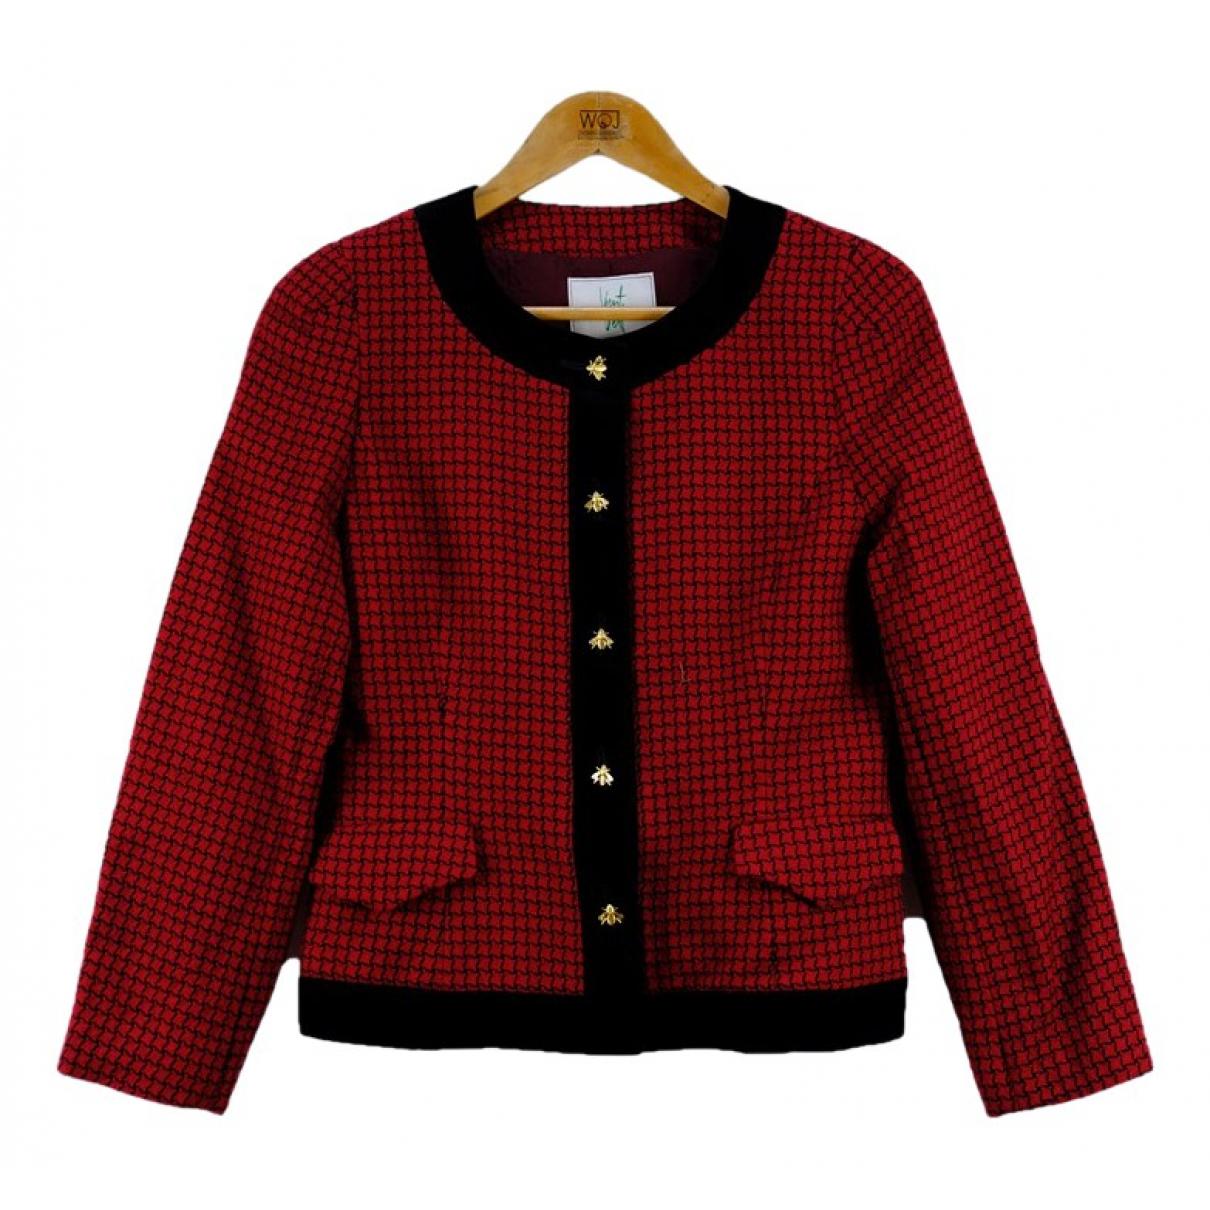 Pierre Balmain \N Red Wool jacket for Women M International